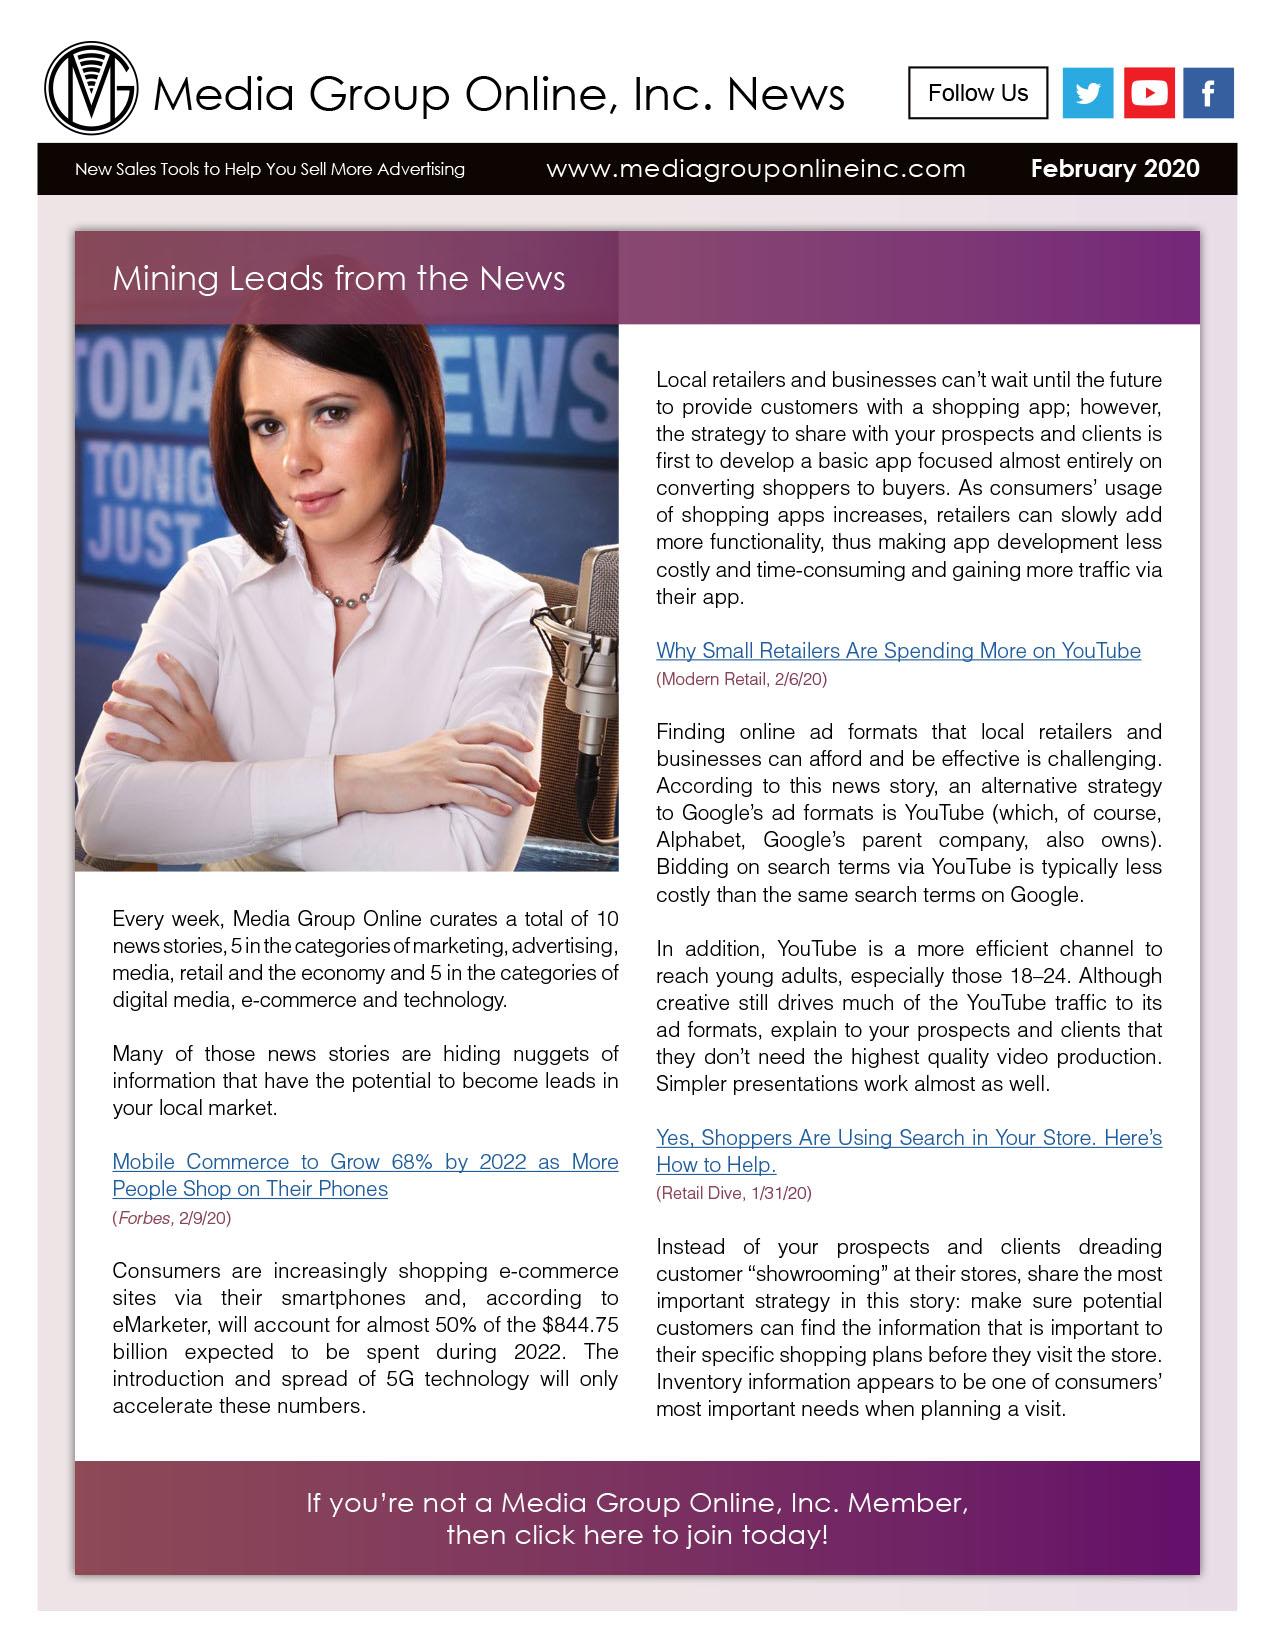 February 2020 Newsletter 8.5x11 PDF